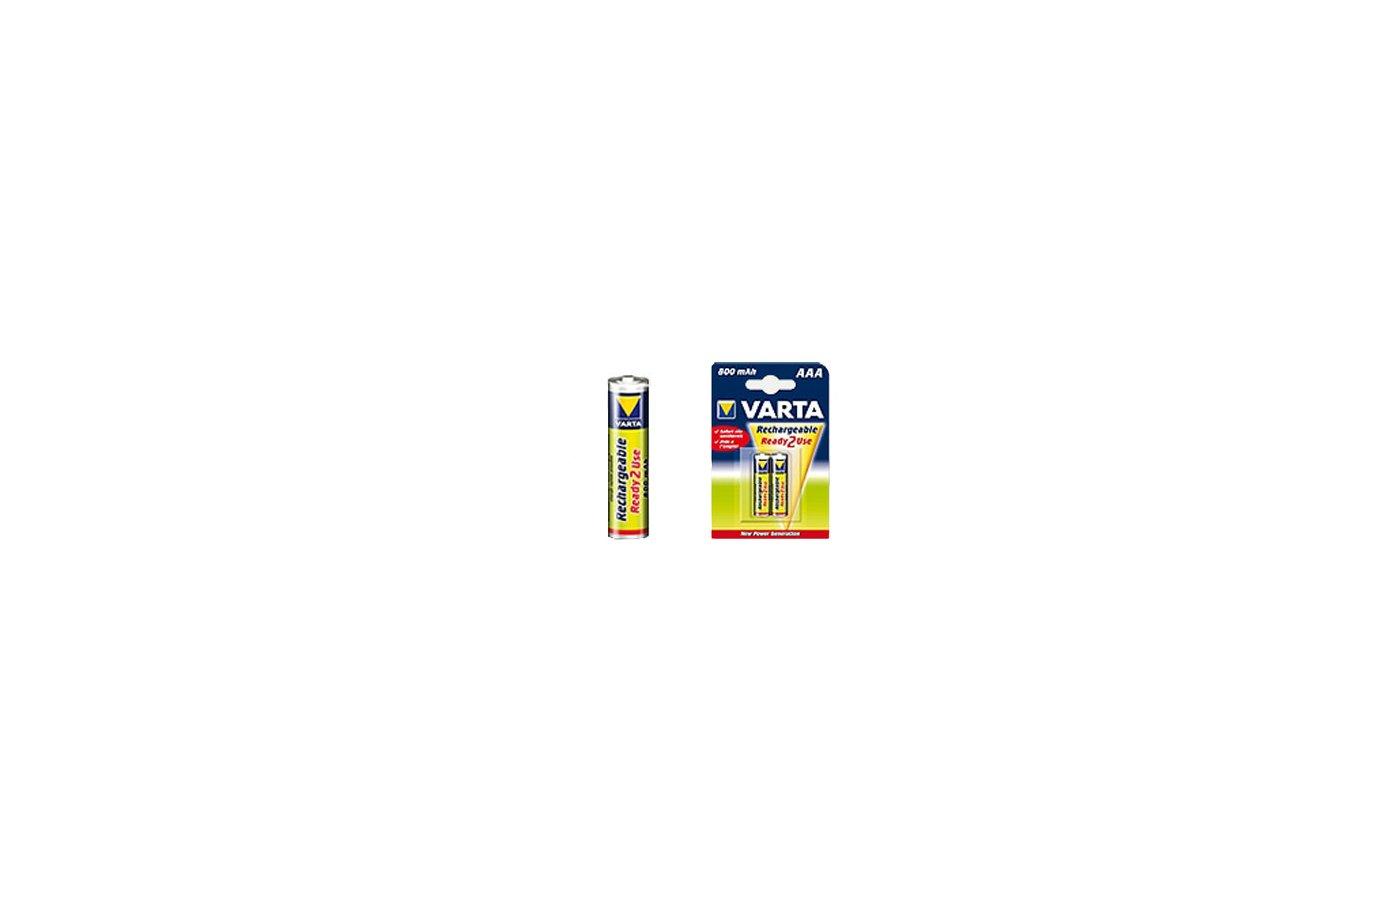 Аккумулятор VARTA Ready2Use AAA 800 BL2 (цена за блистер) (56703)